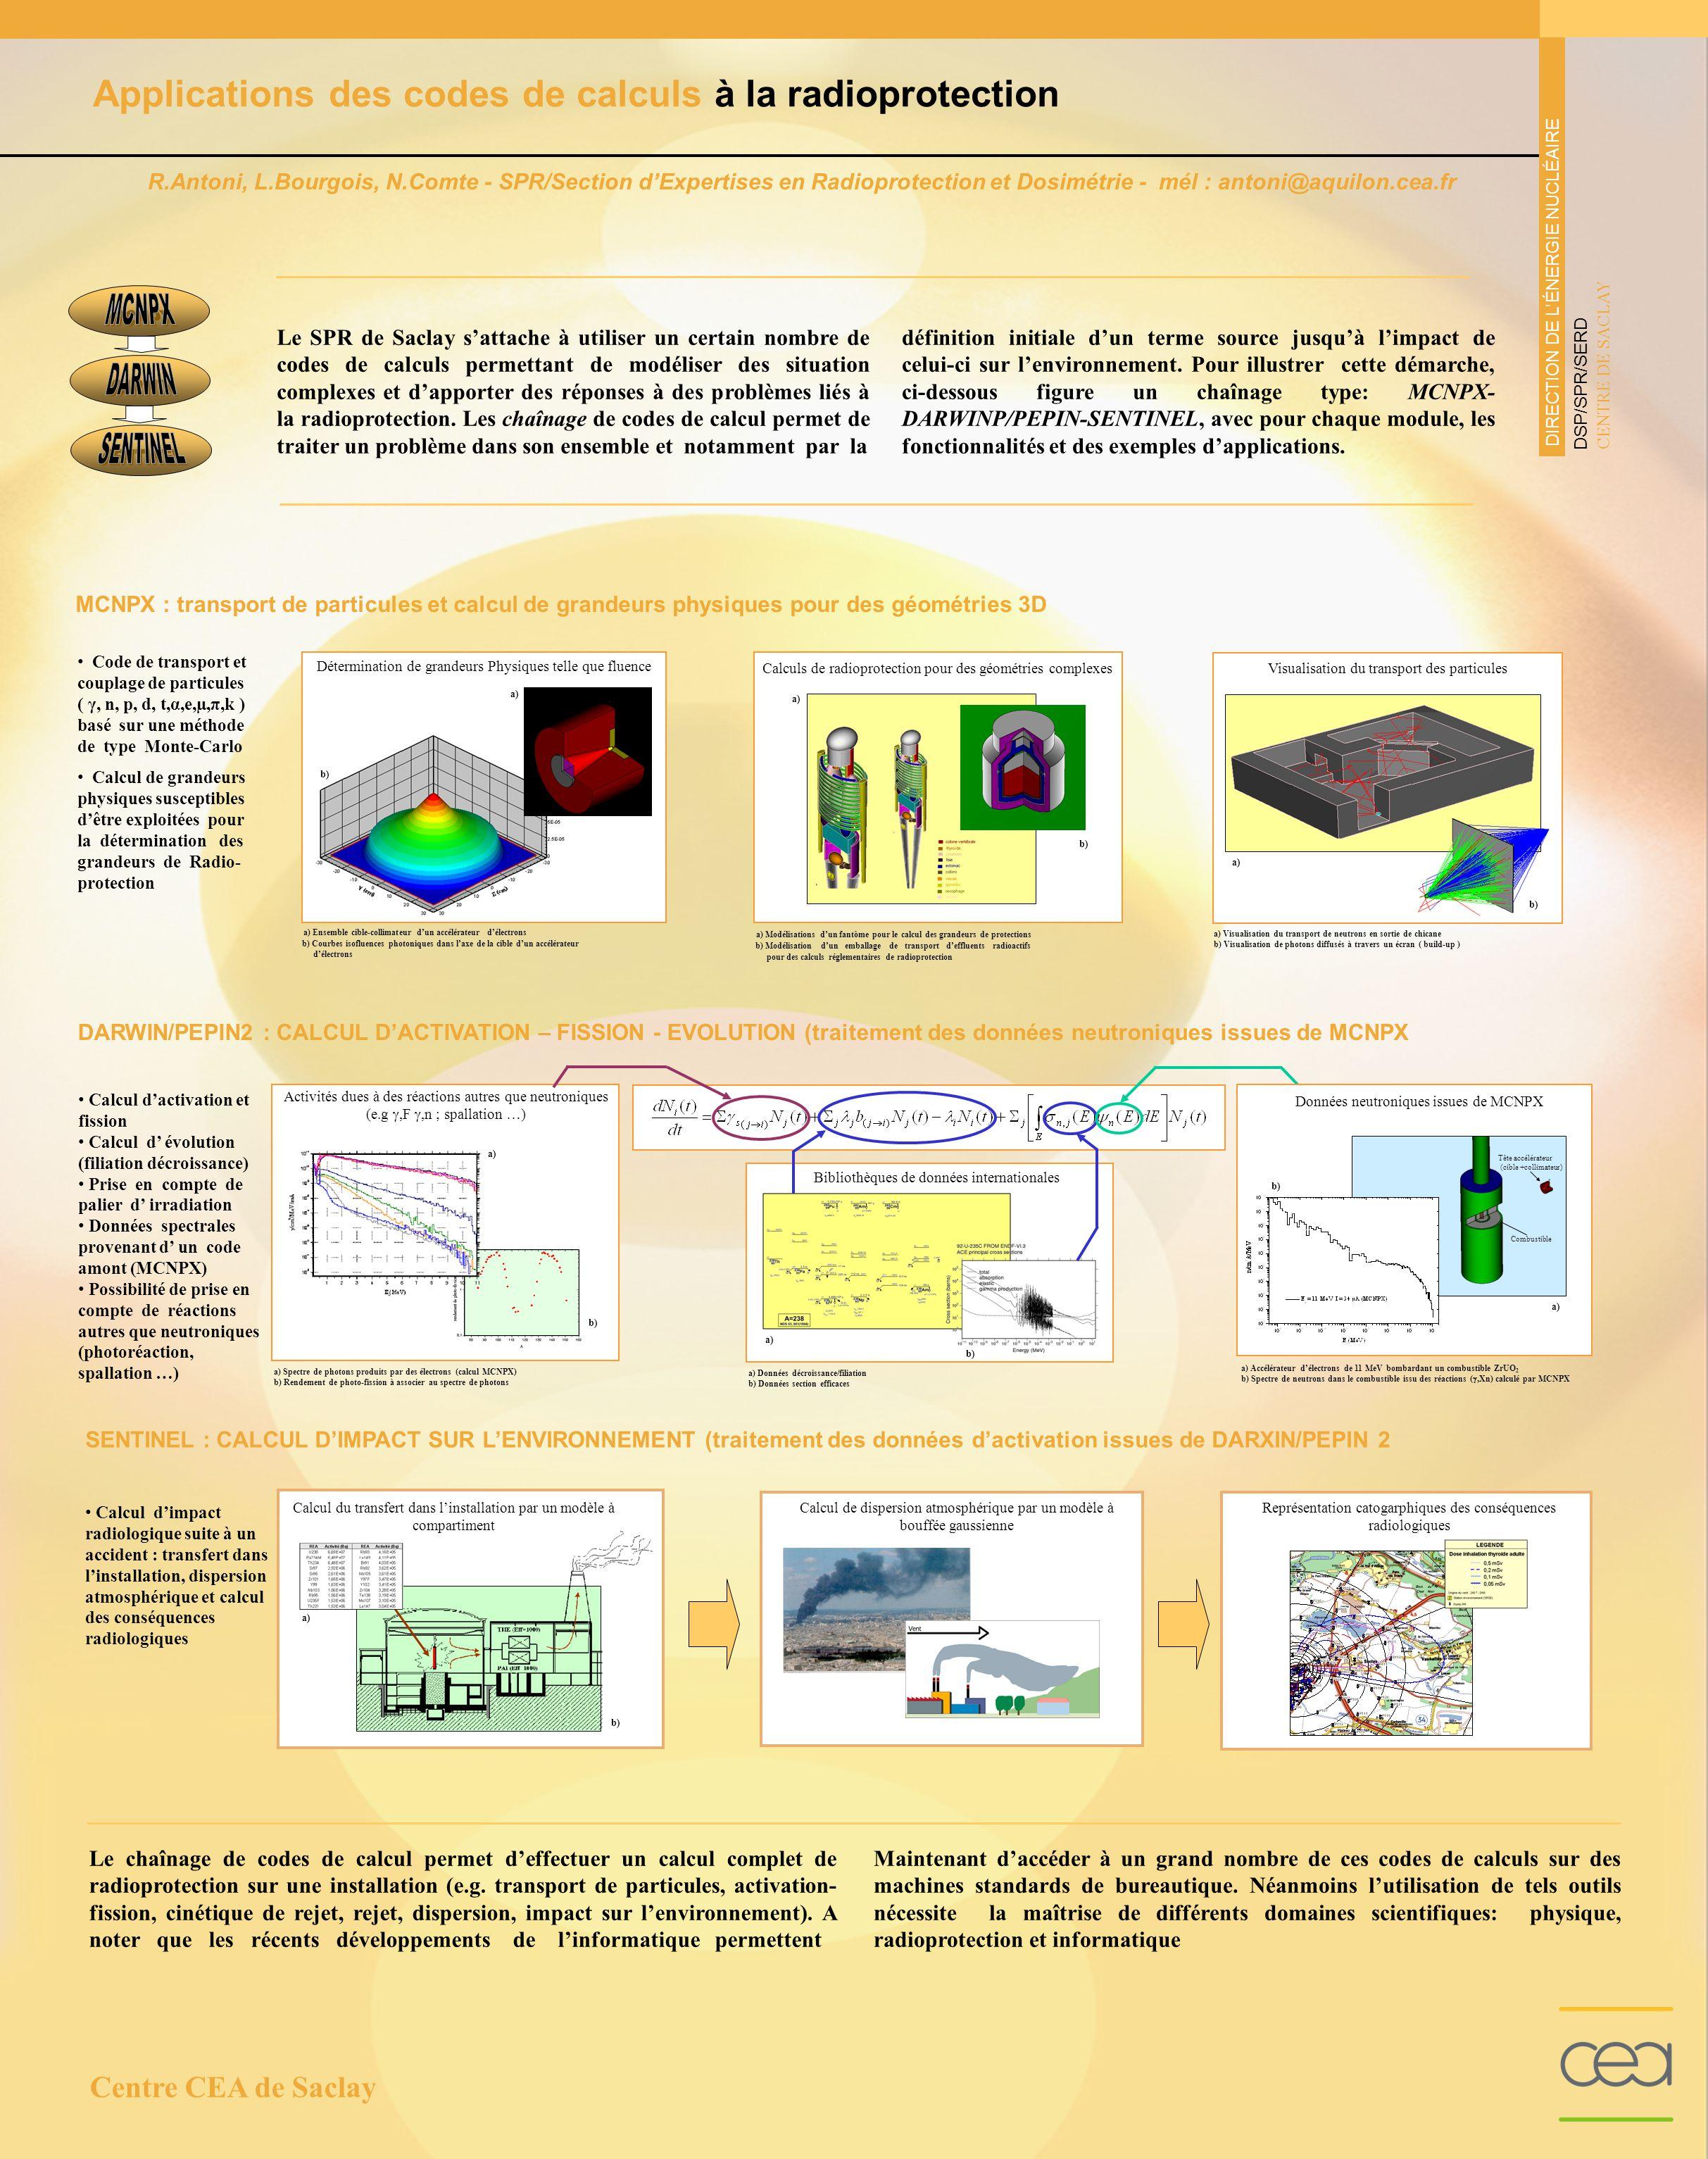 Centre CEA de Saclay Le chaînage de codes de calcul permet deffectuer un calcul complet de radioprotection sur une installation (e.g. transport de par